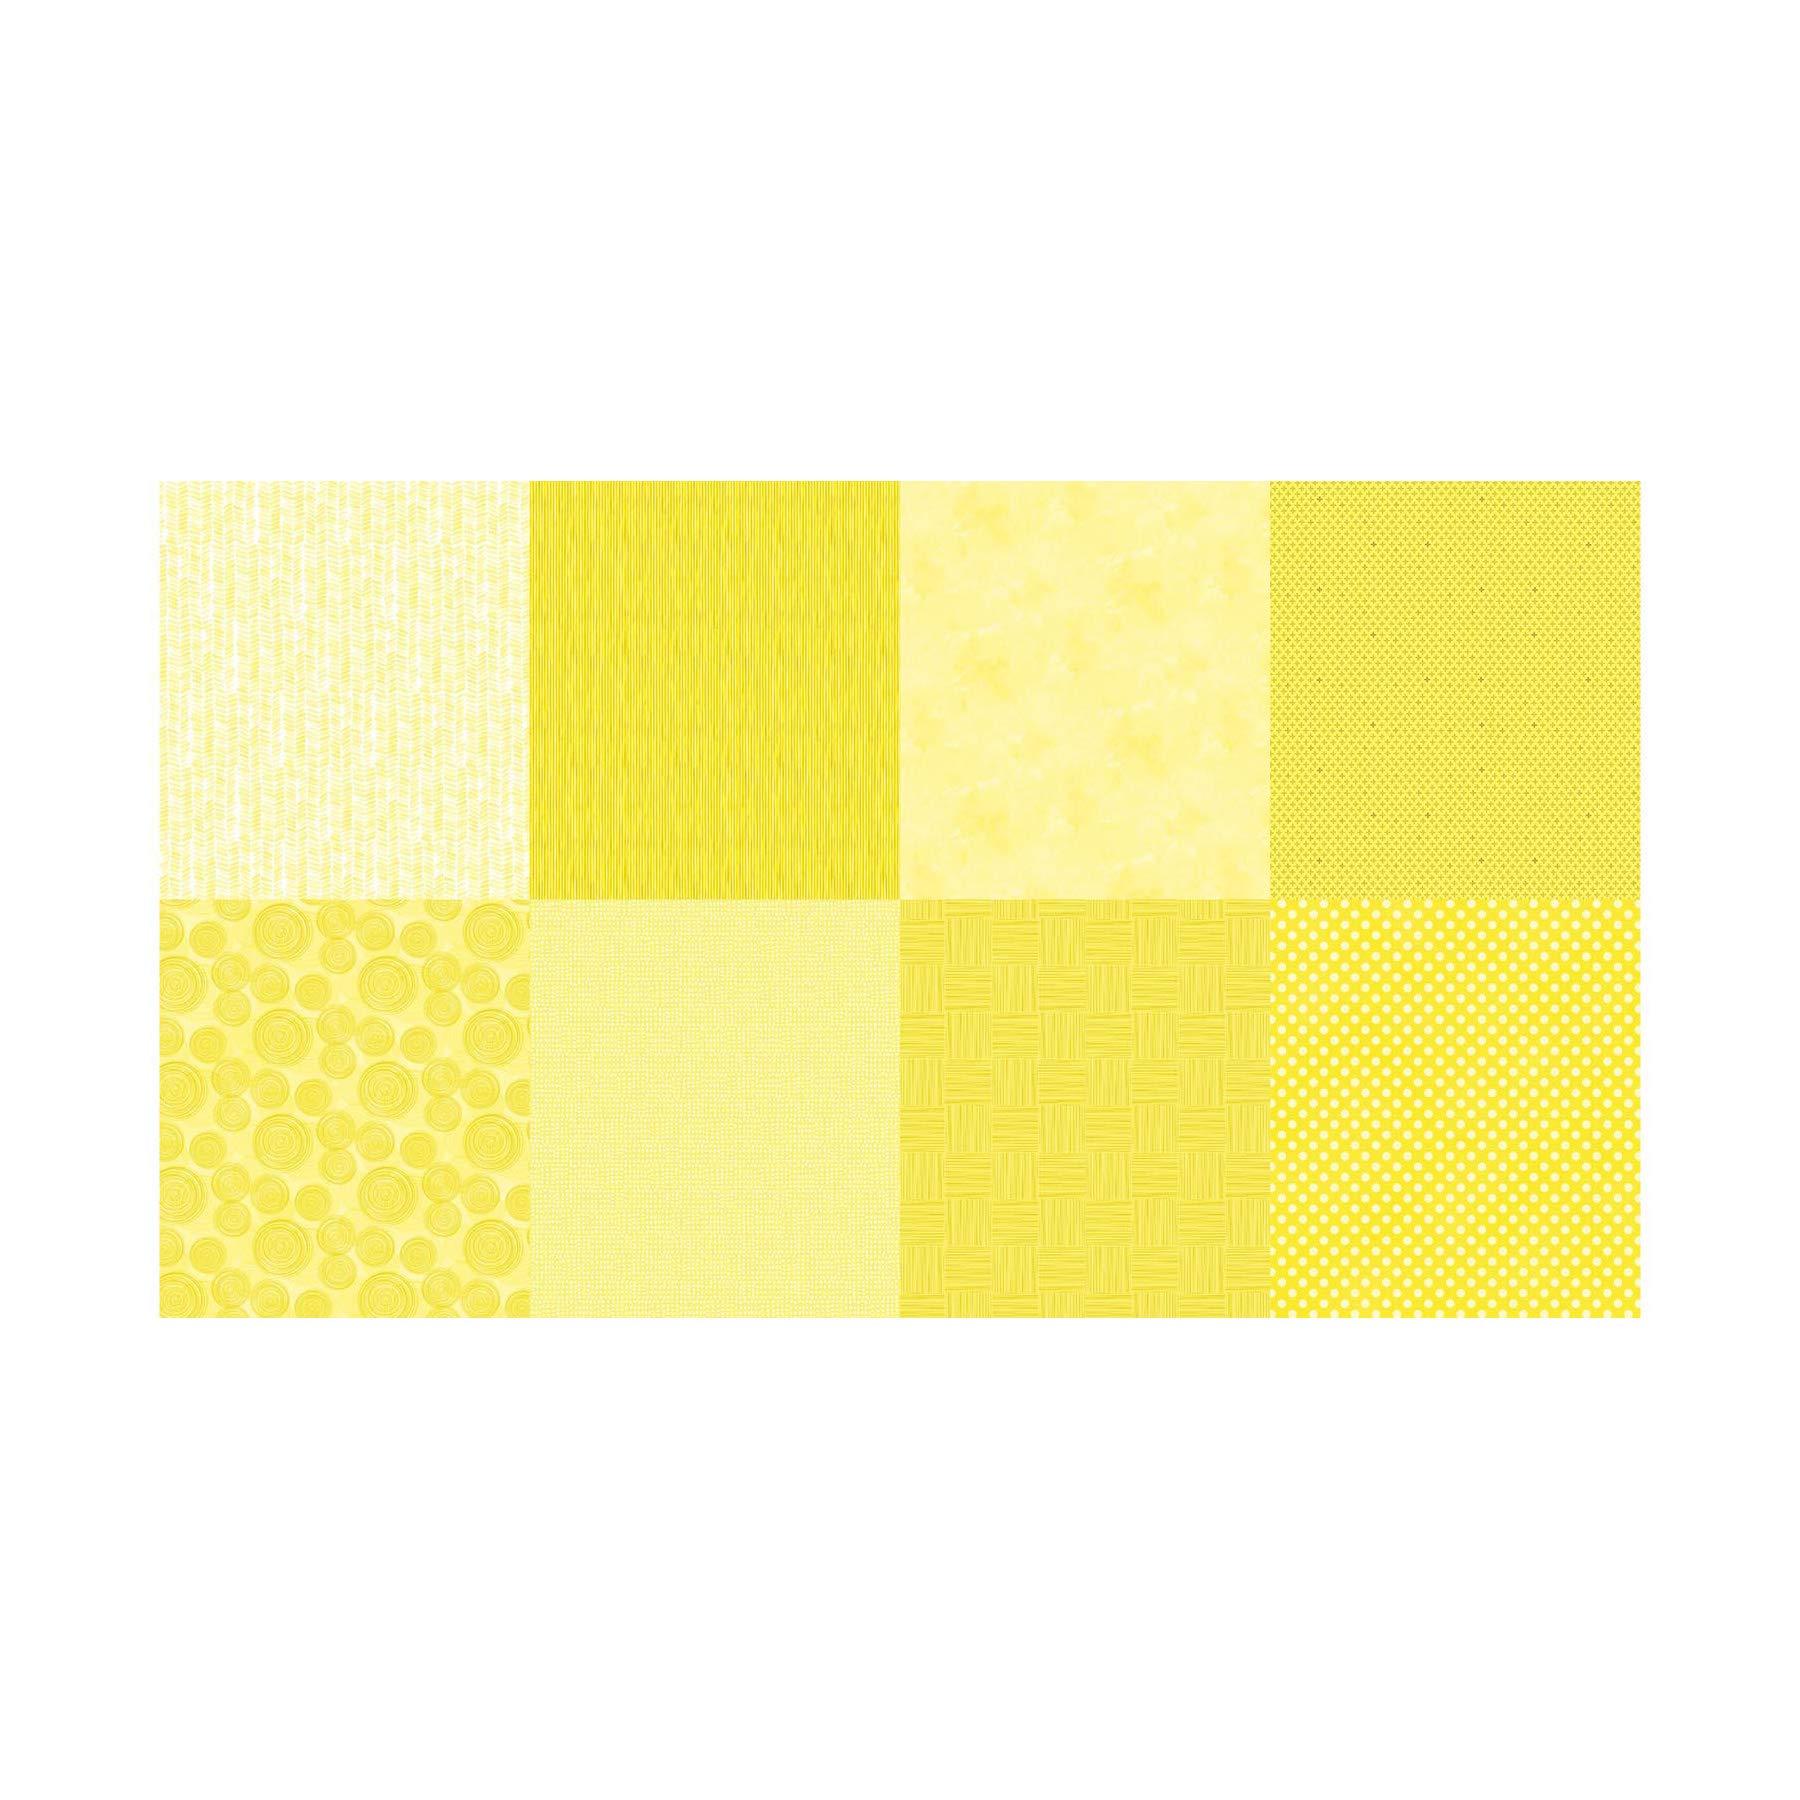 Hoffman Fabrics Hoffman Digital Details 90'' Blender Panel Fabric, Lemon